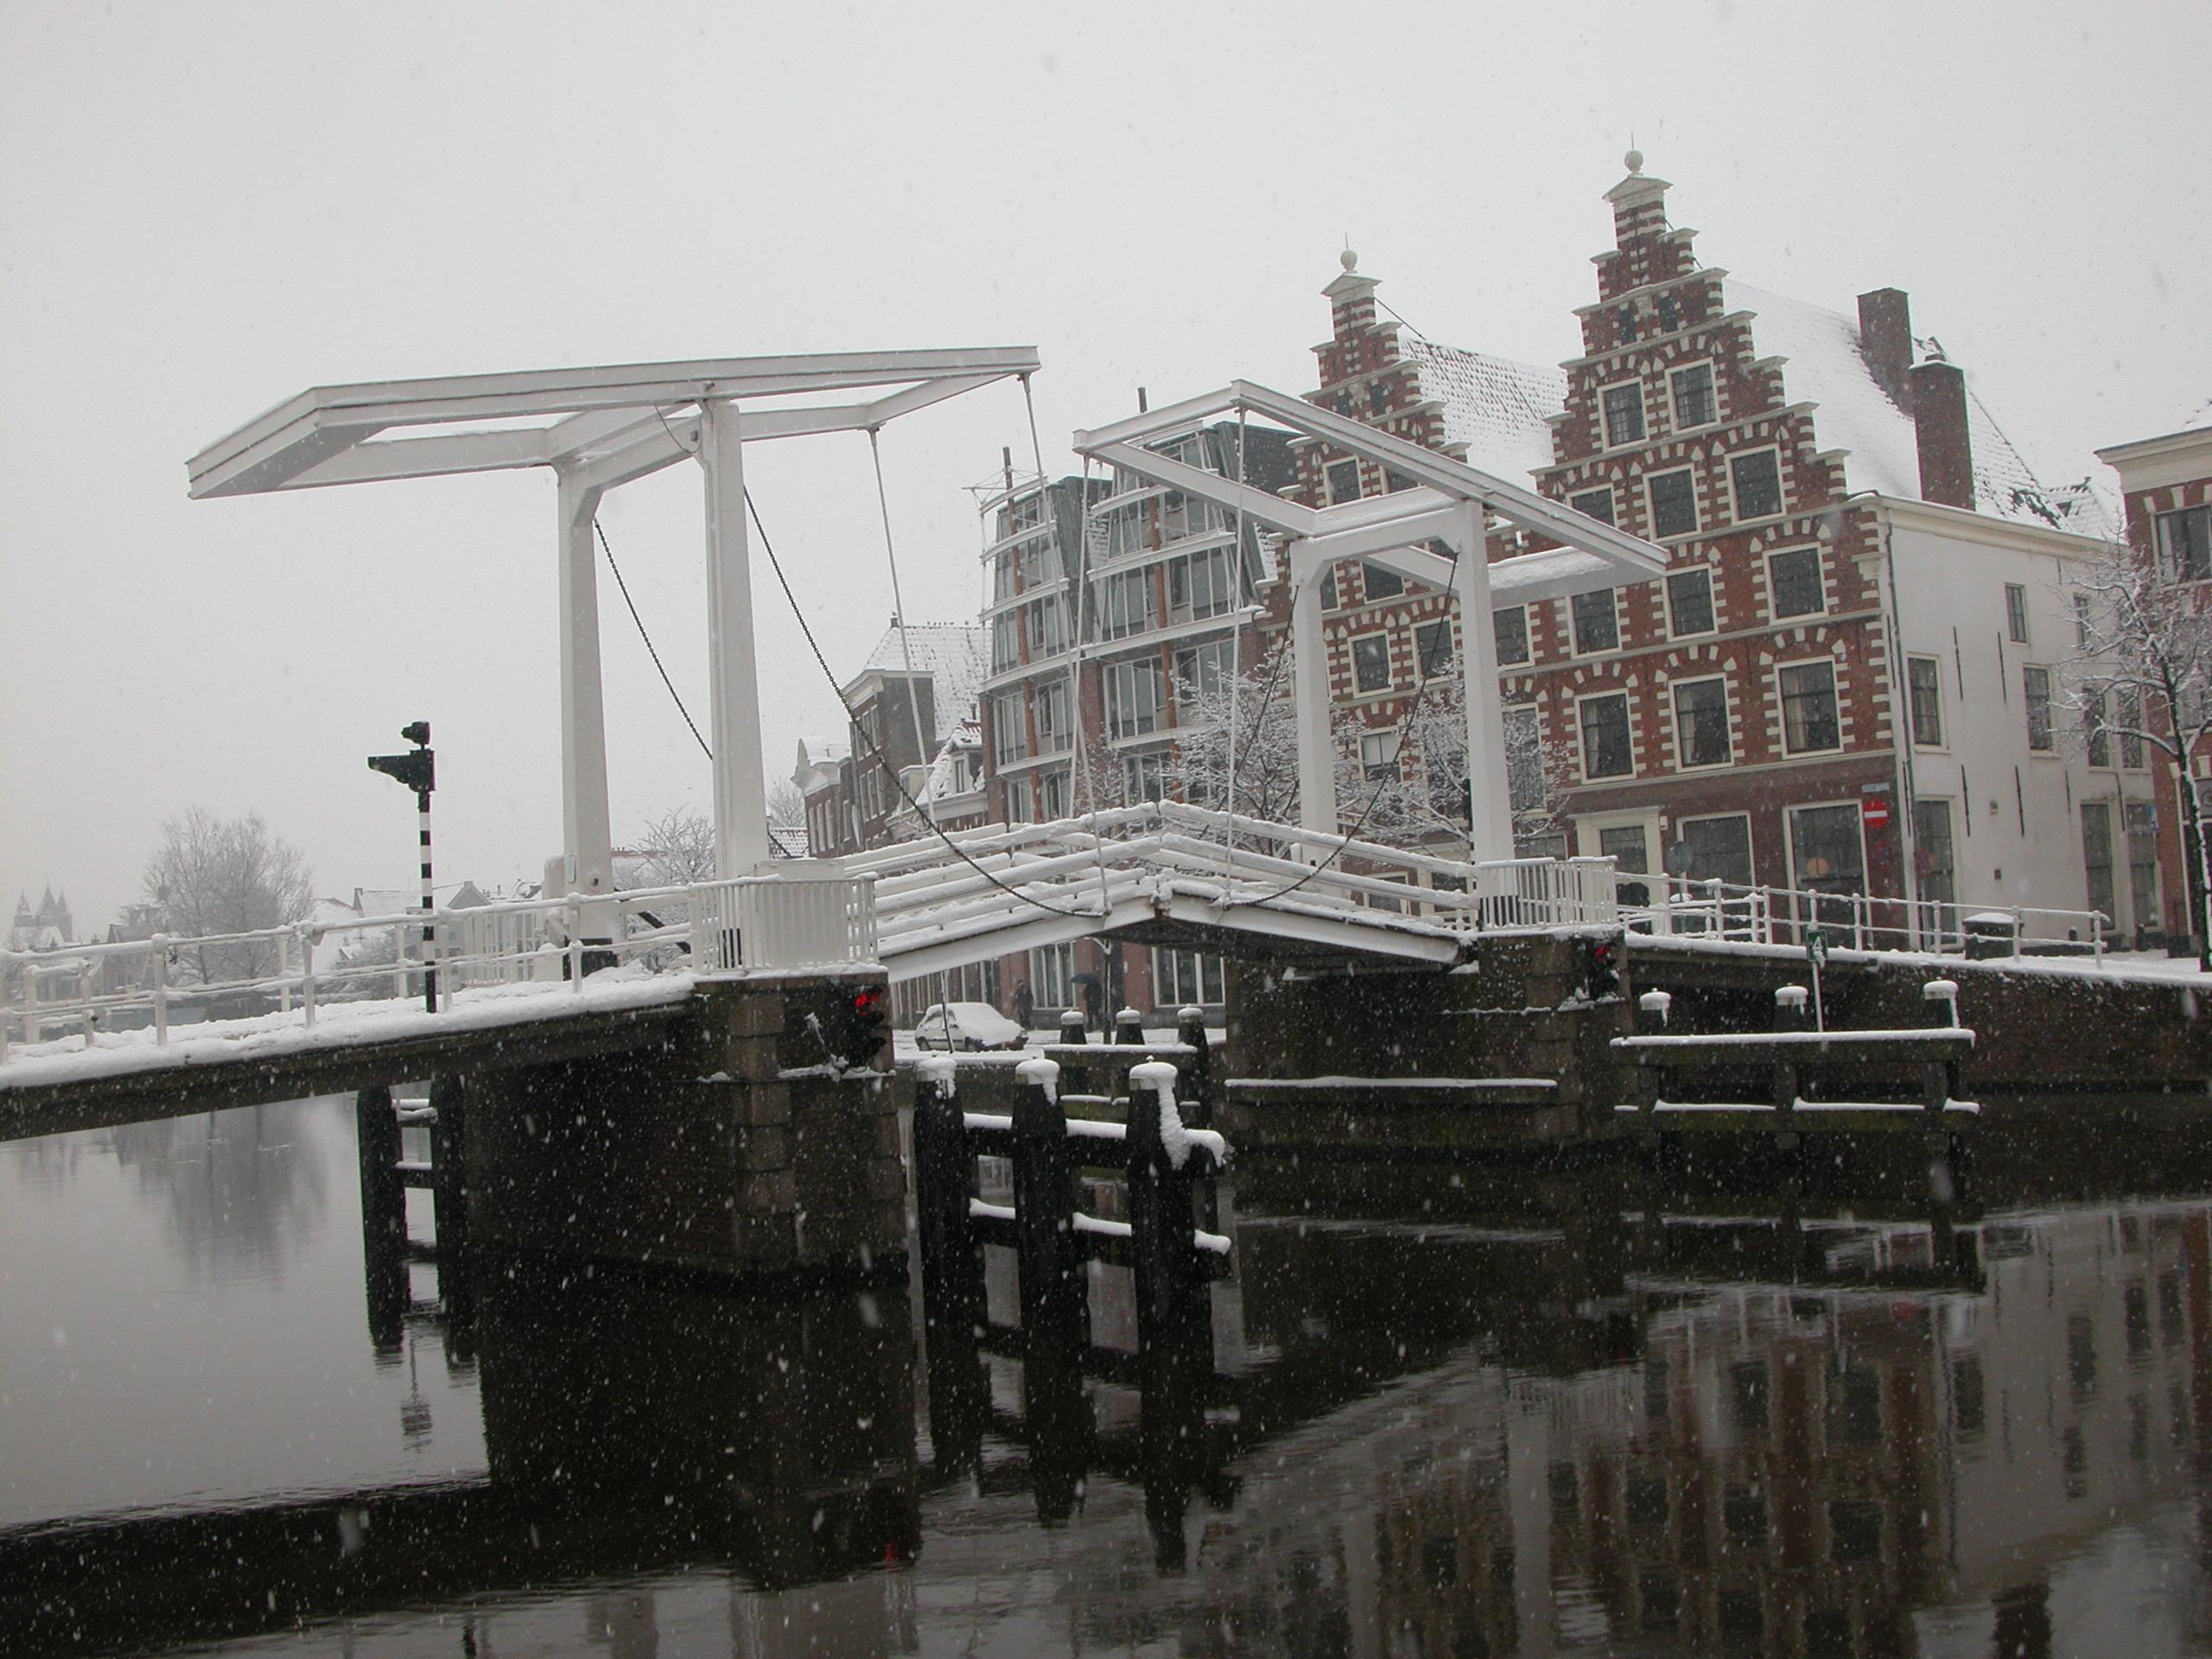 drawbridge bridge snow haarlem city stepped gable dutch house houses architecture exterior royalty free